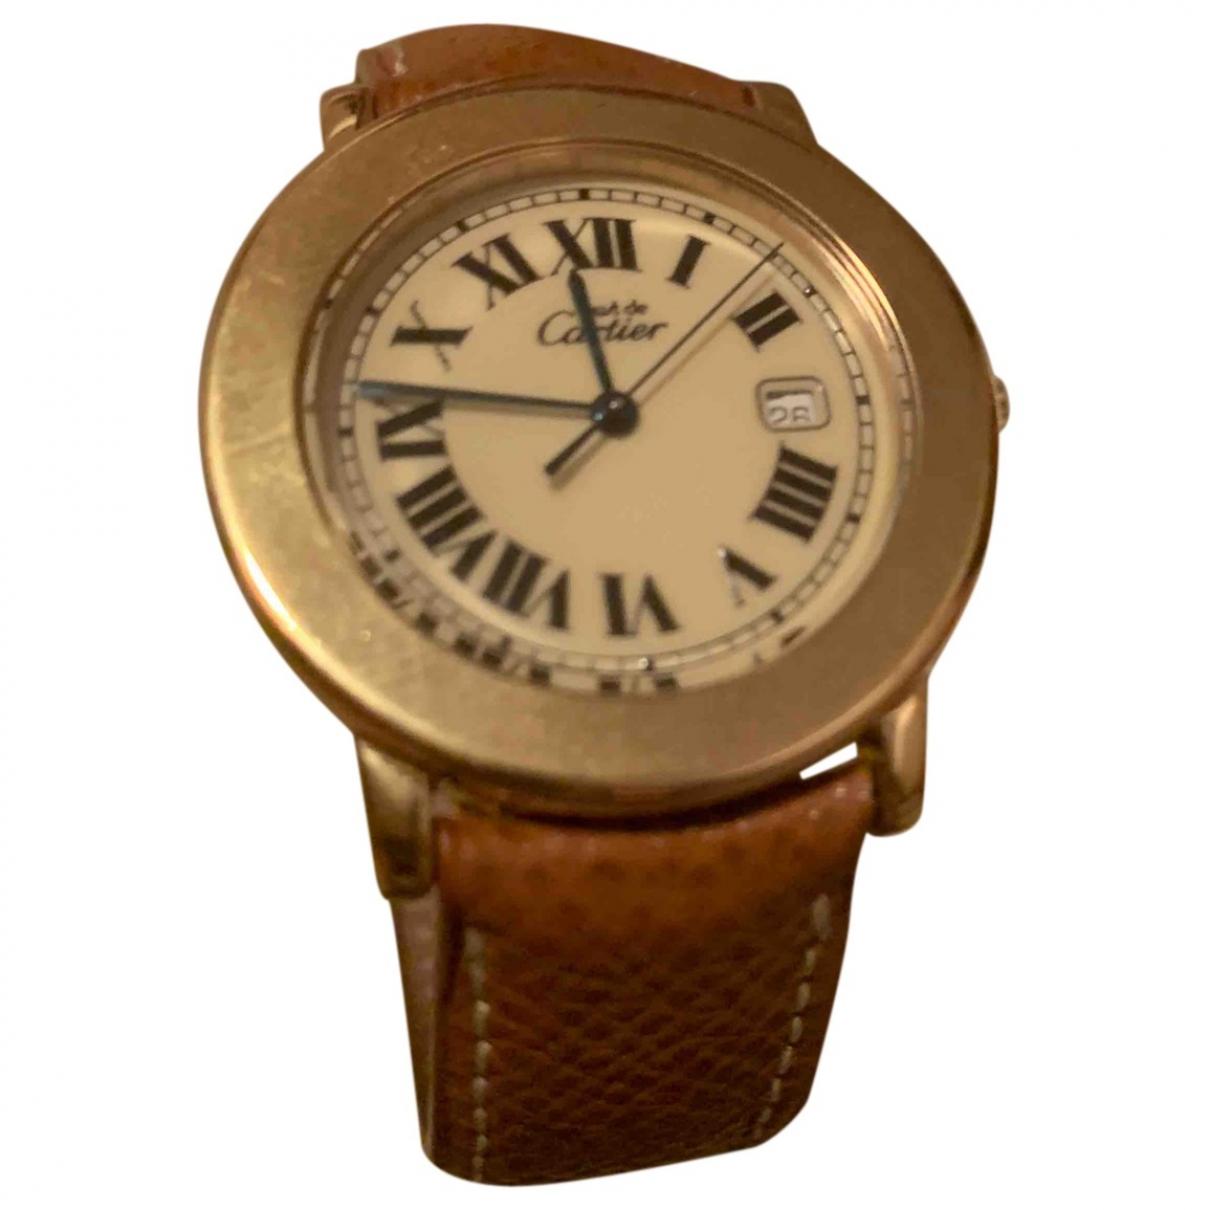 Reloj de Bermellon Cartier